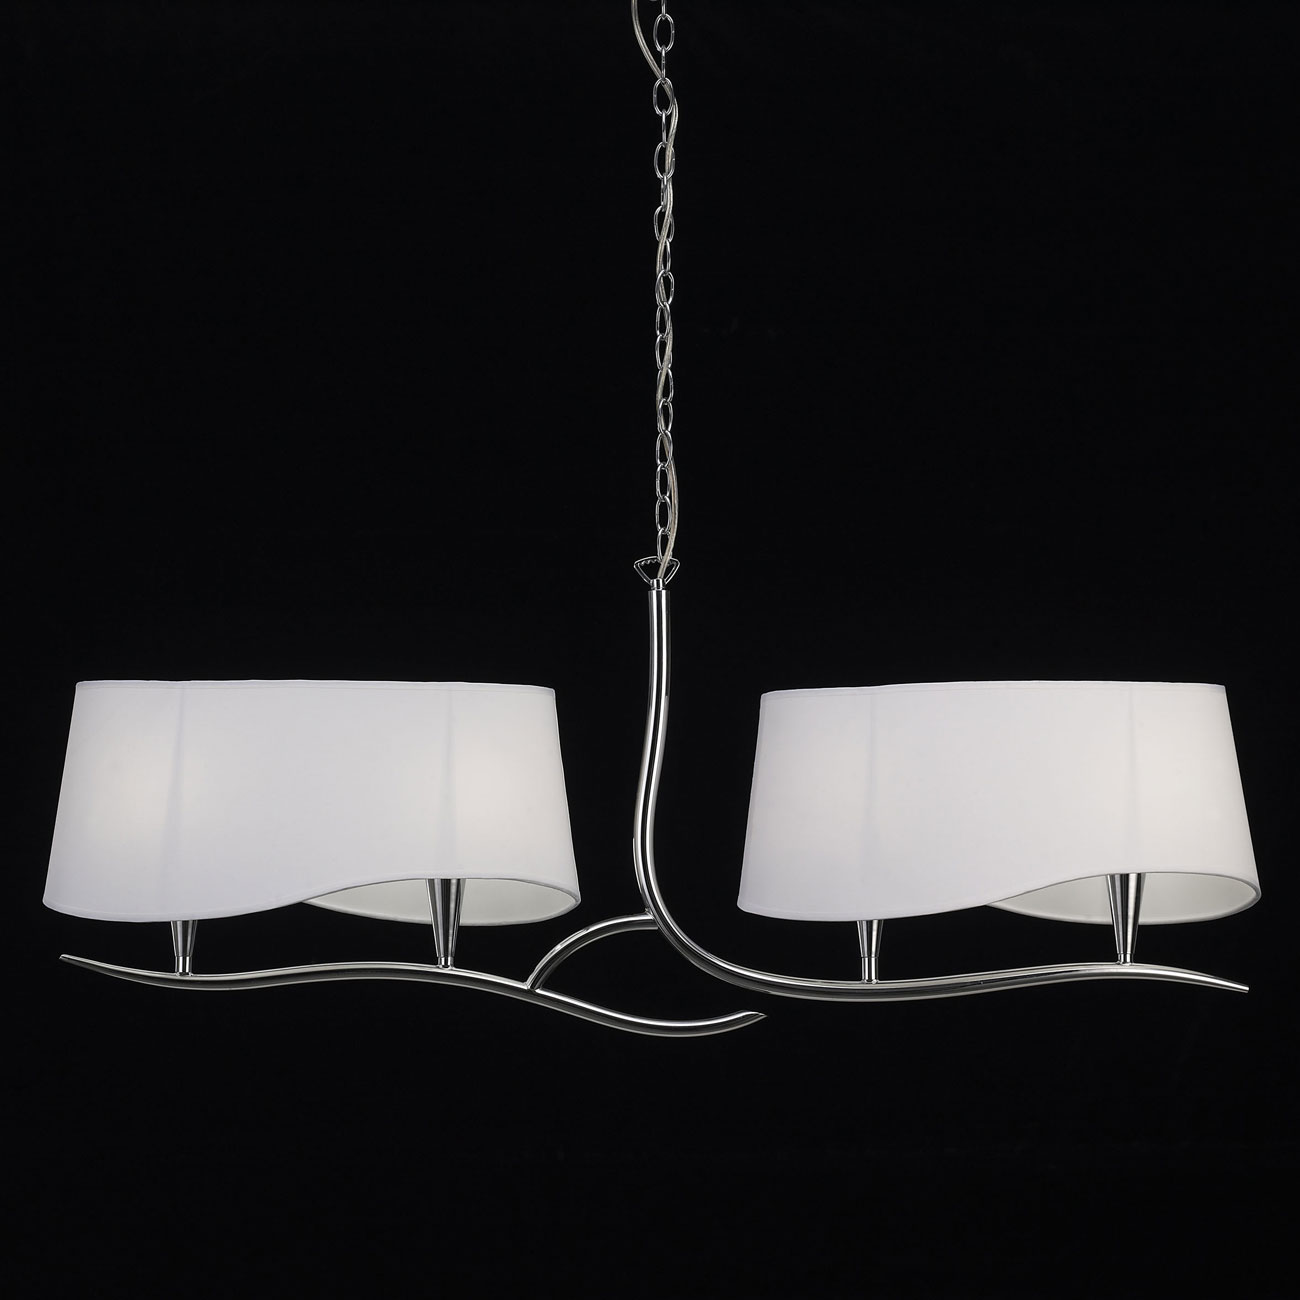 Ninette Lamp linear 4L 4 x 20w E14 Chrome white lampshade